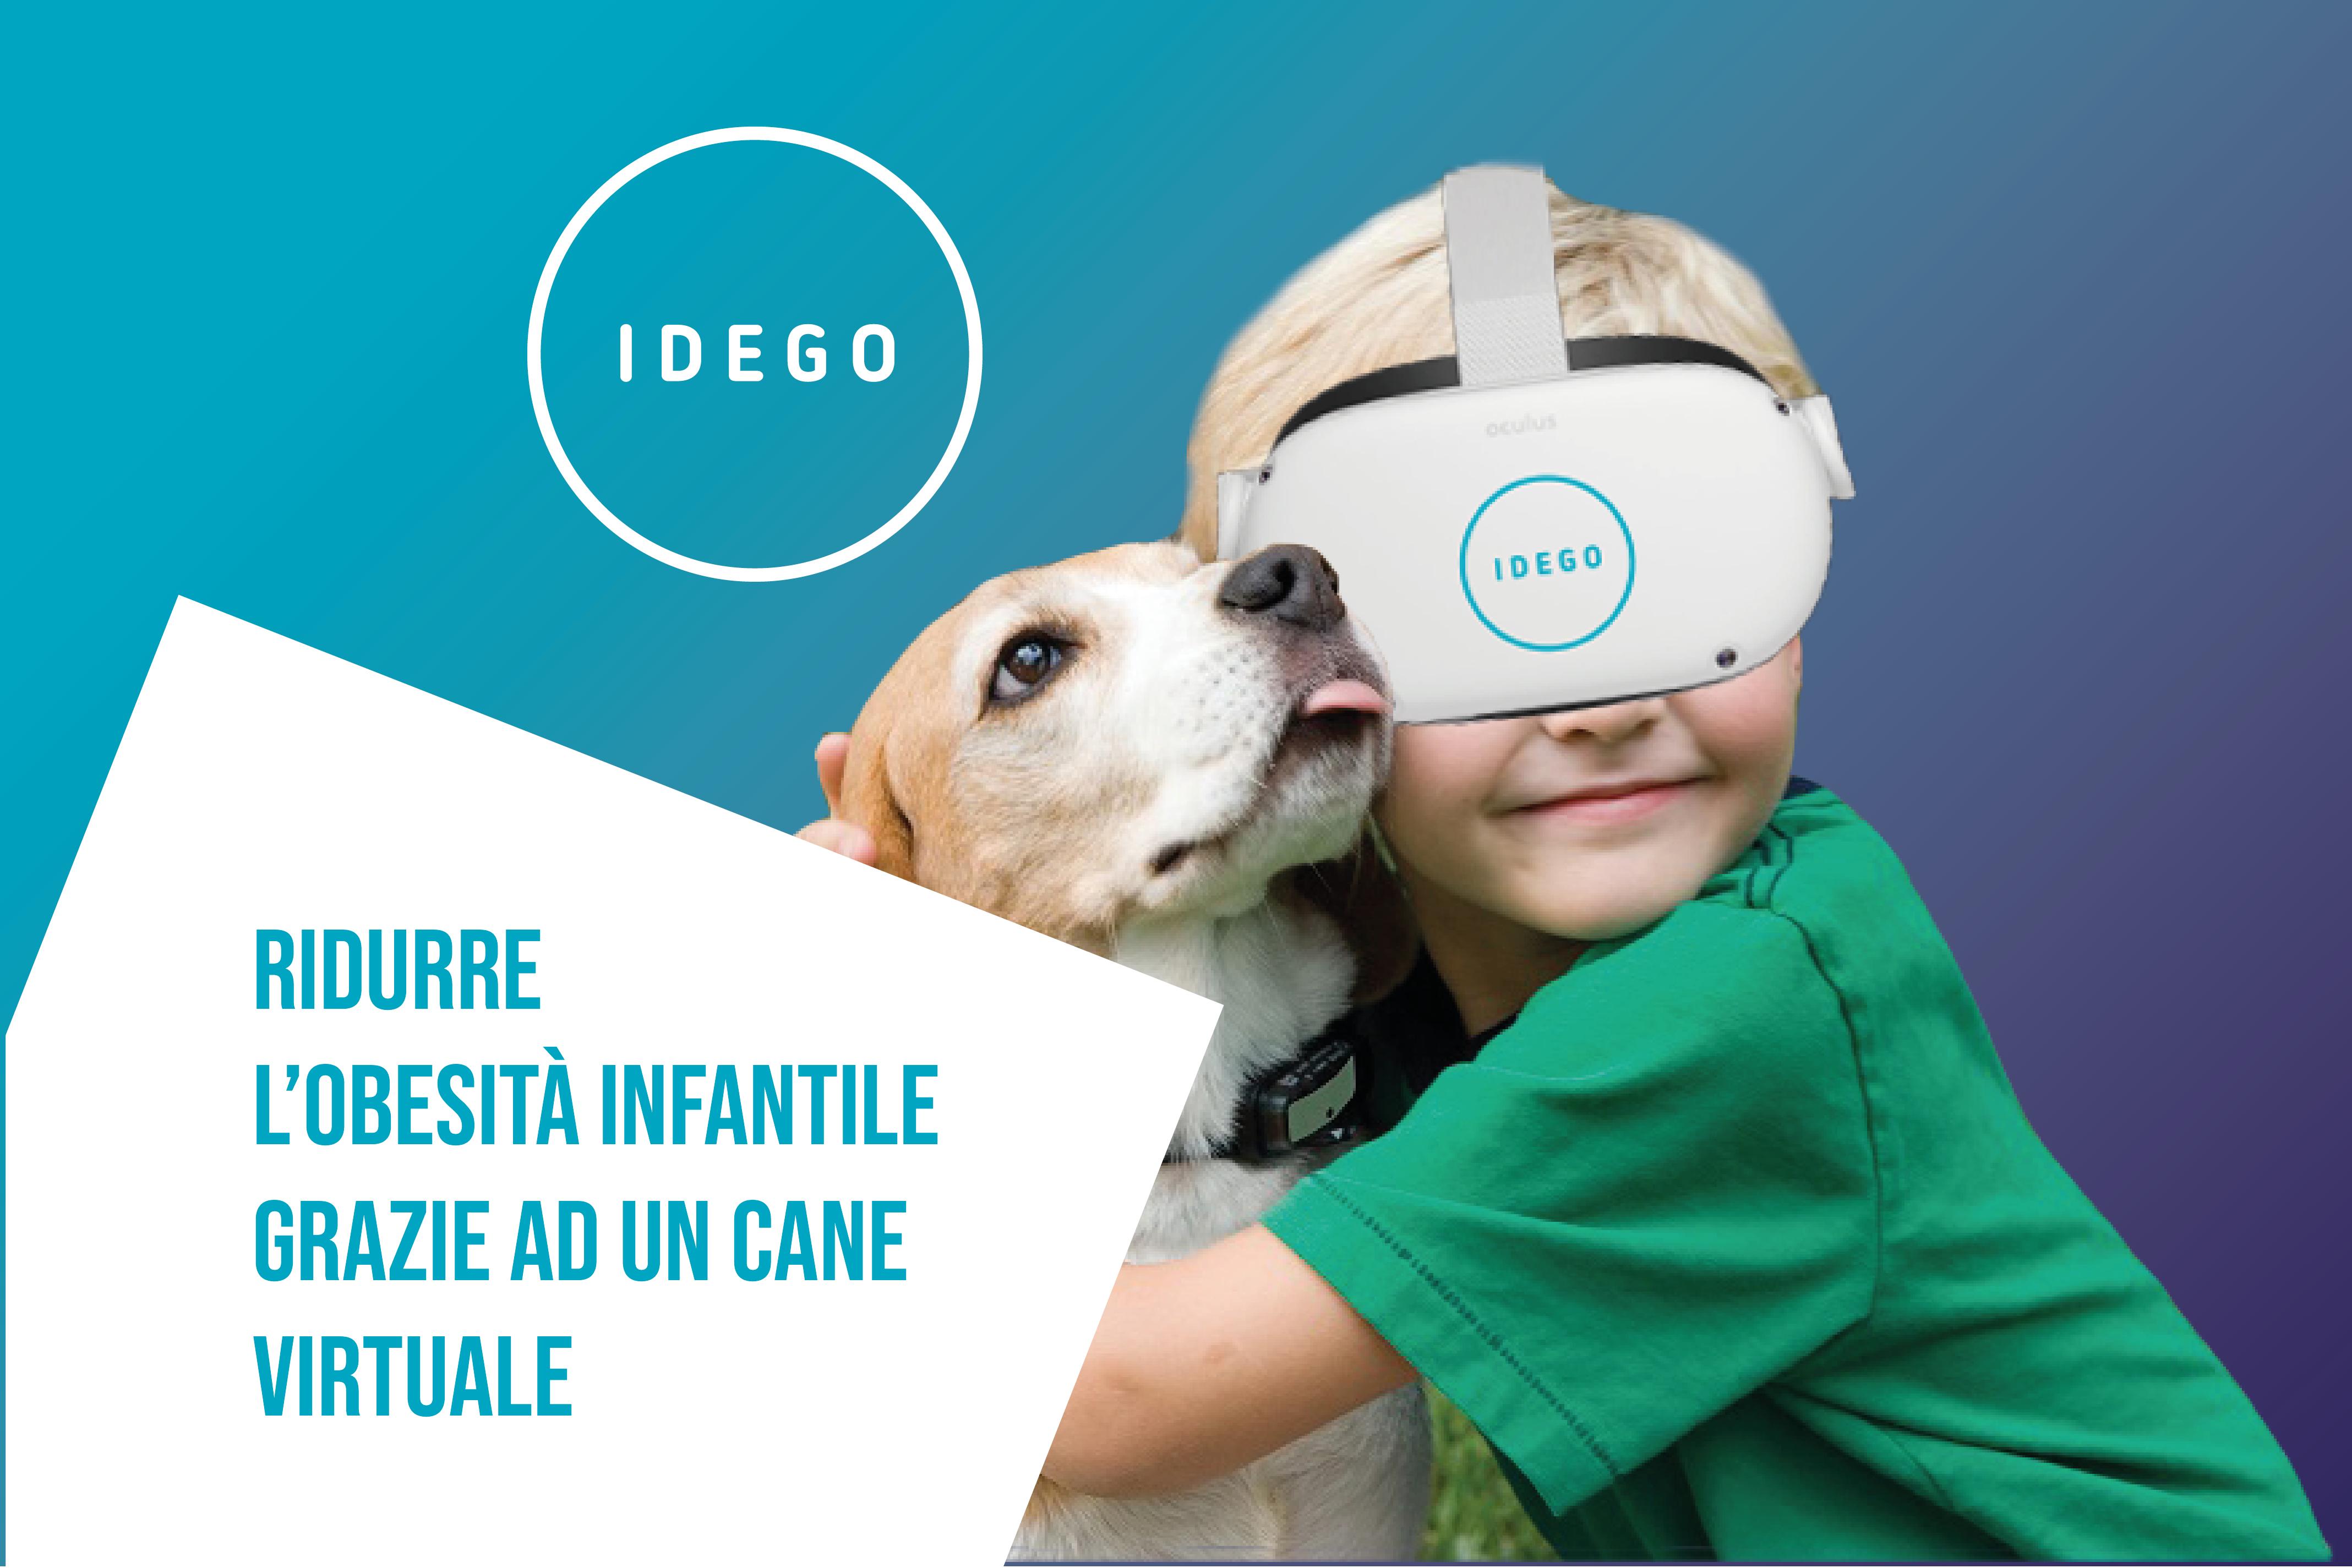 Ridurre L'obesità Infantile Grazie Ad Un Cane Virtuale